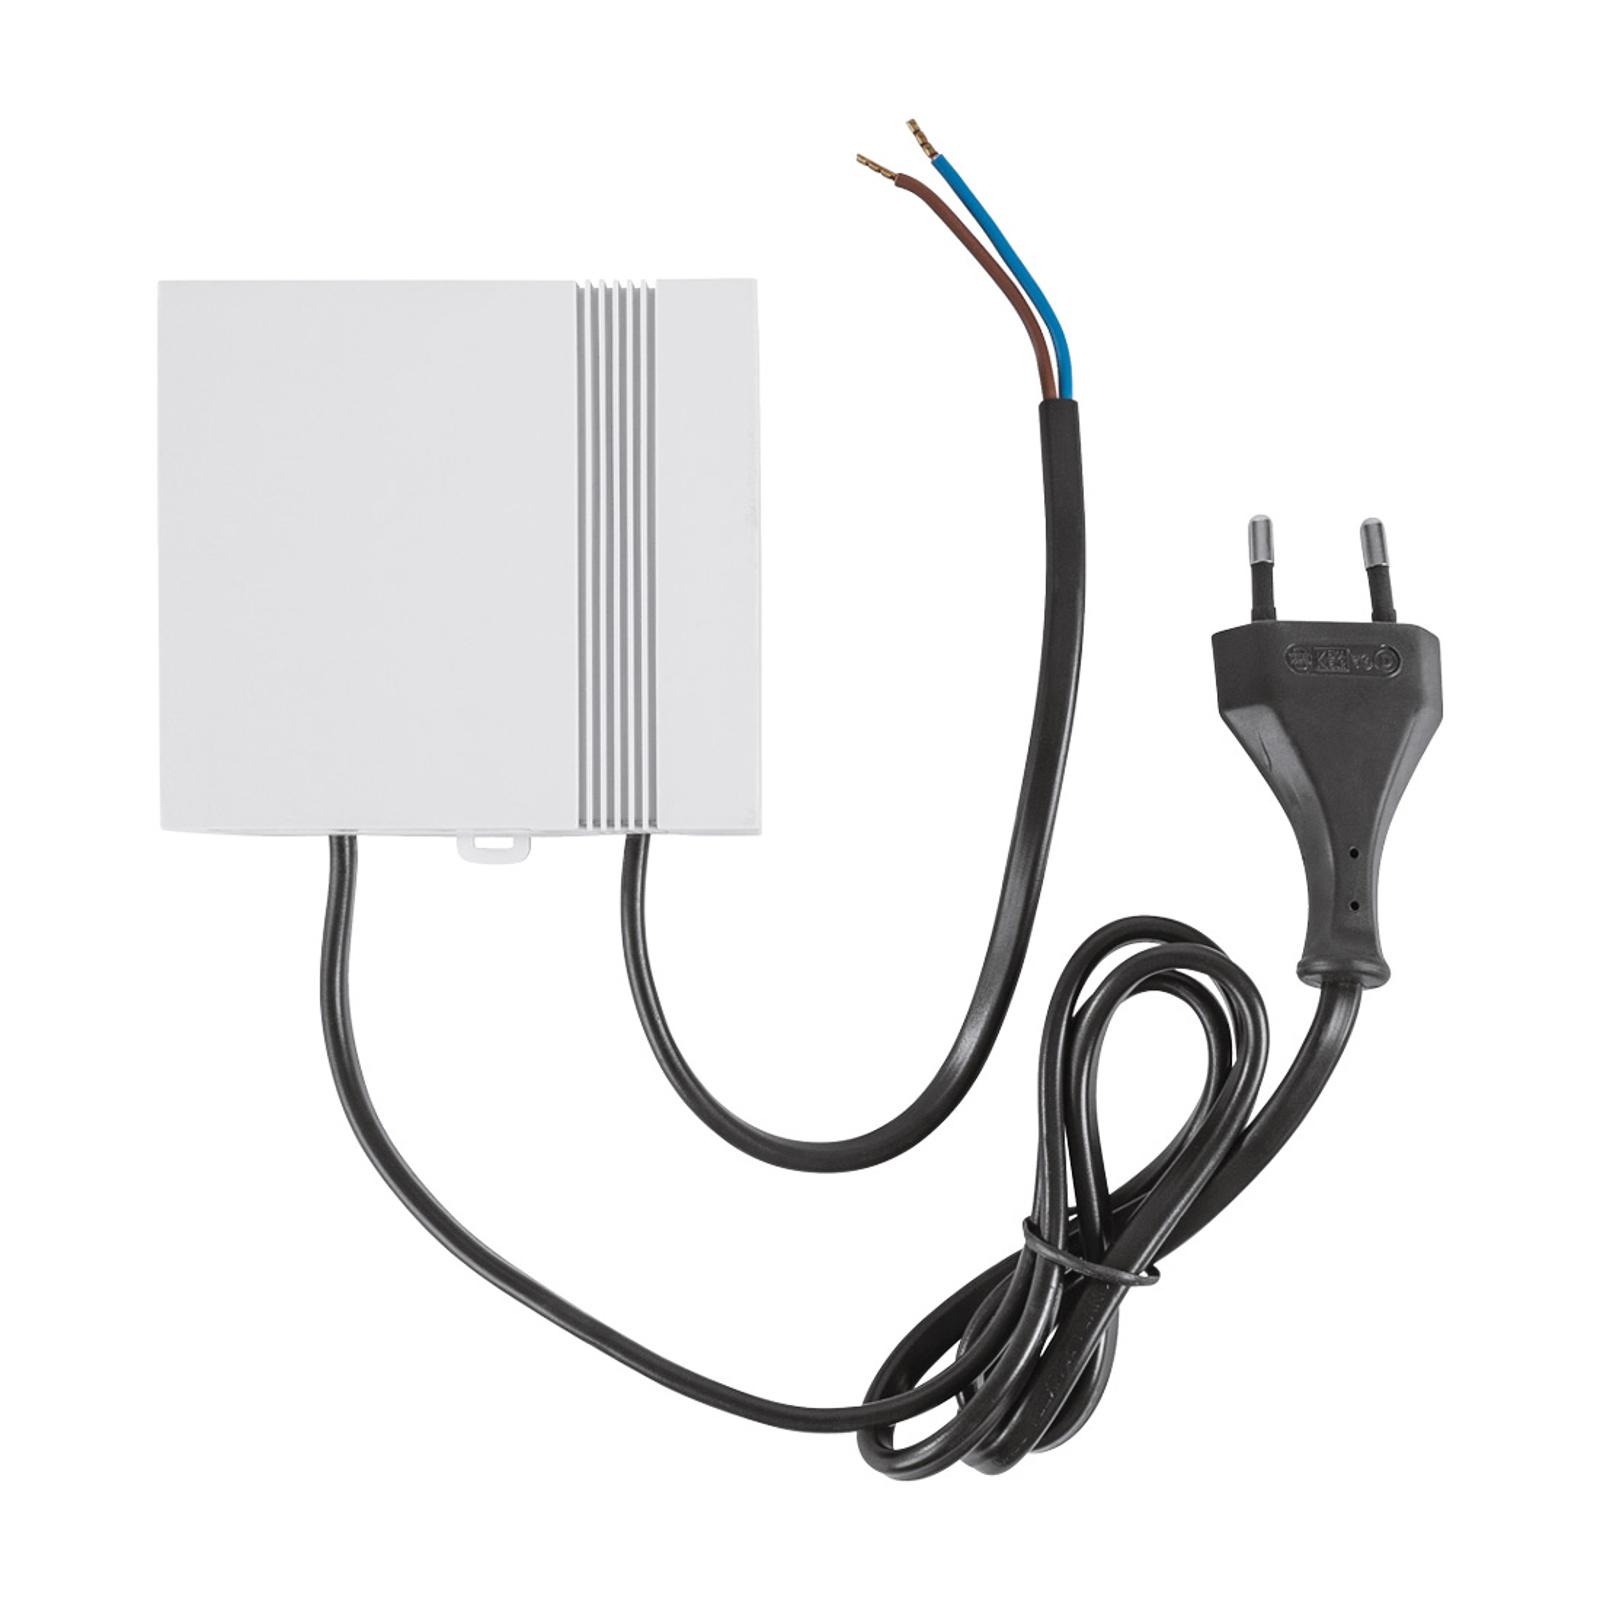 Homematic IP Trafo für Fußbodenheizungsaktoren 24V